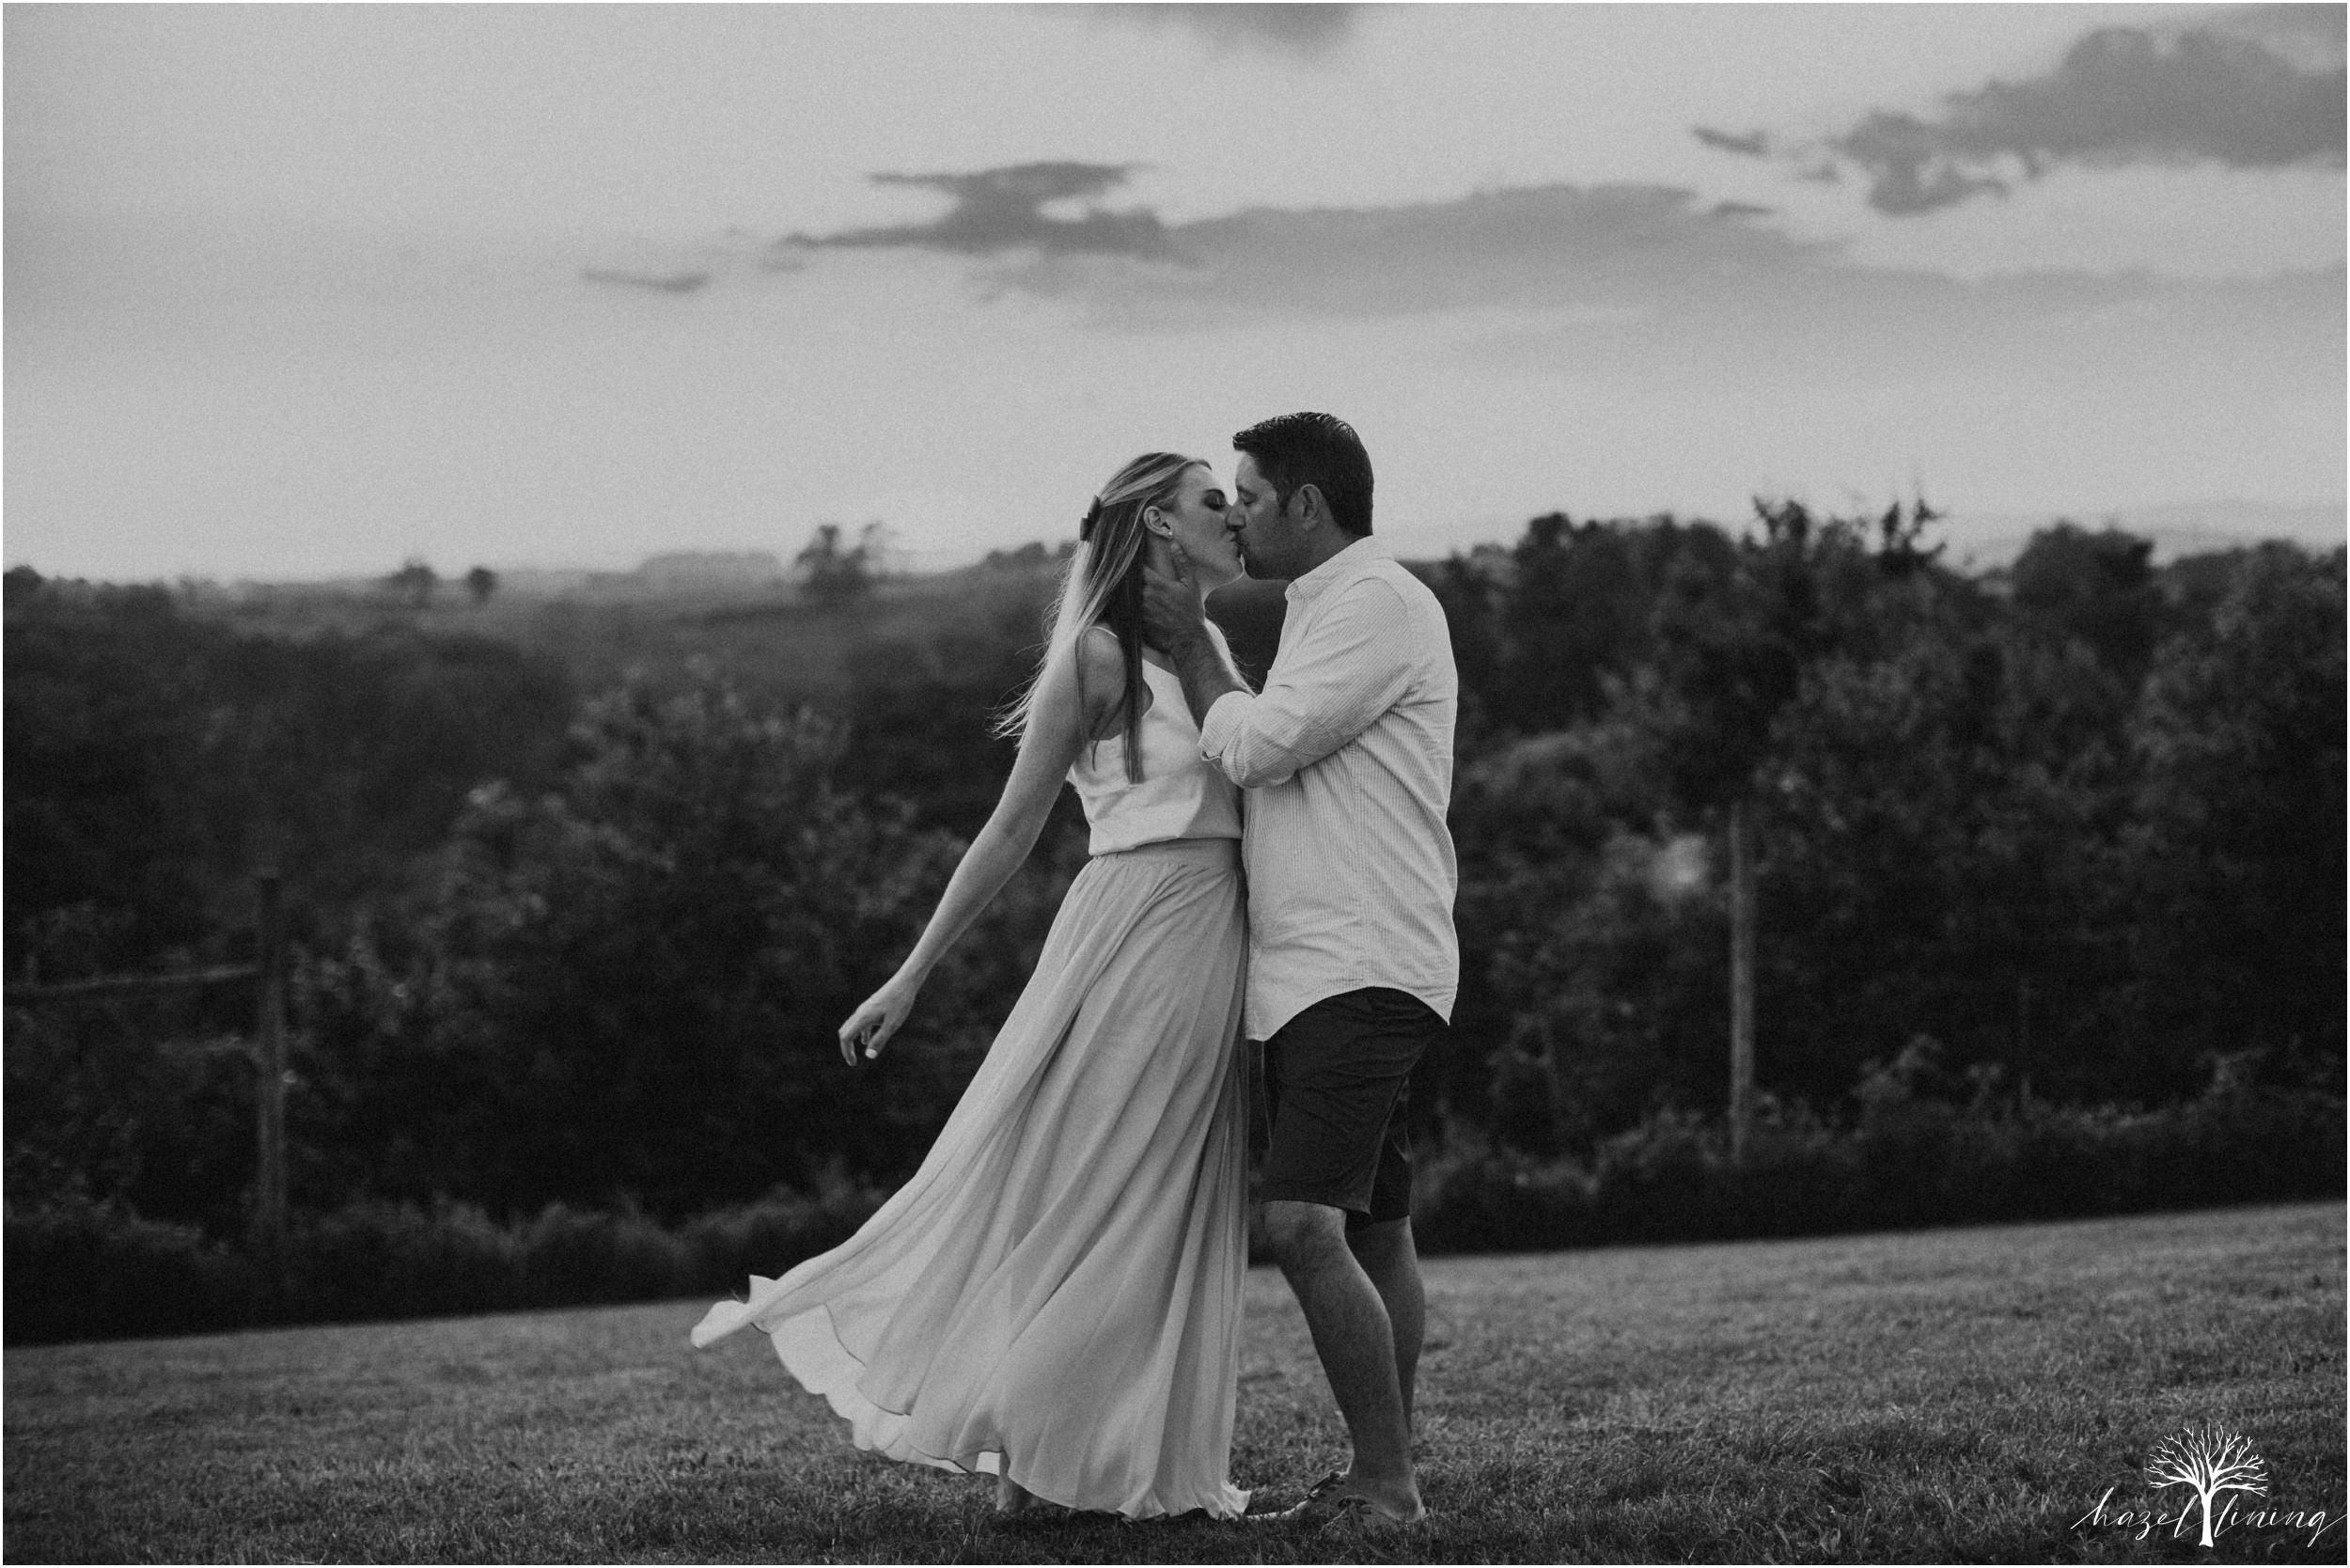 ashley-fillmore-steve-reimer-trexler-nature-preserve-summer-engagement-session-schnecksville-pennsylvania-hazel-lining-photography-destination-elopement-wedding-engagement-photography_0061.jpg